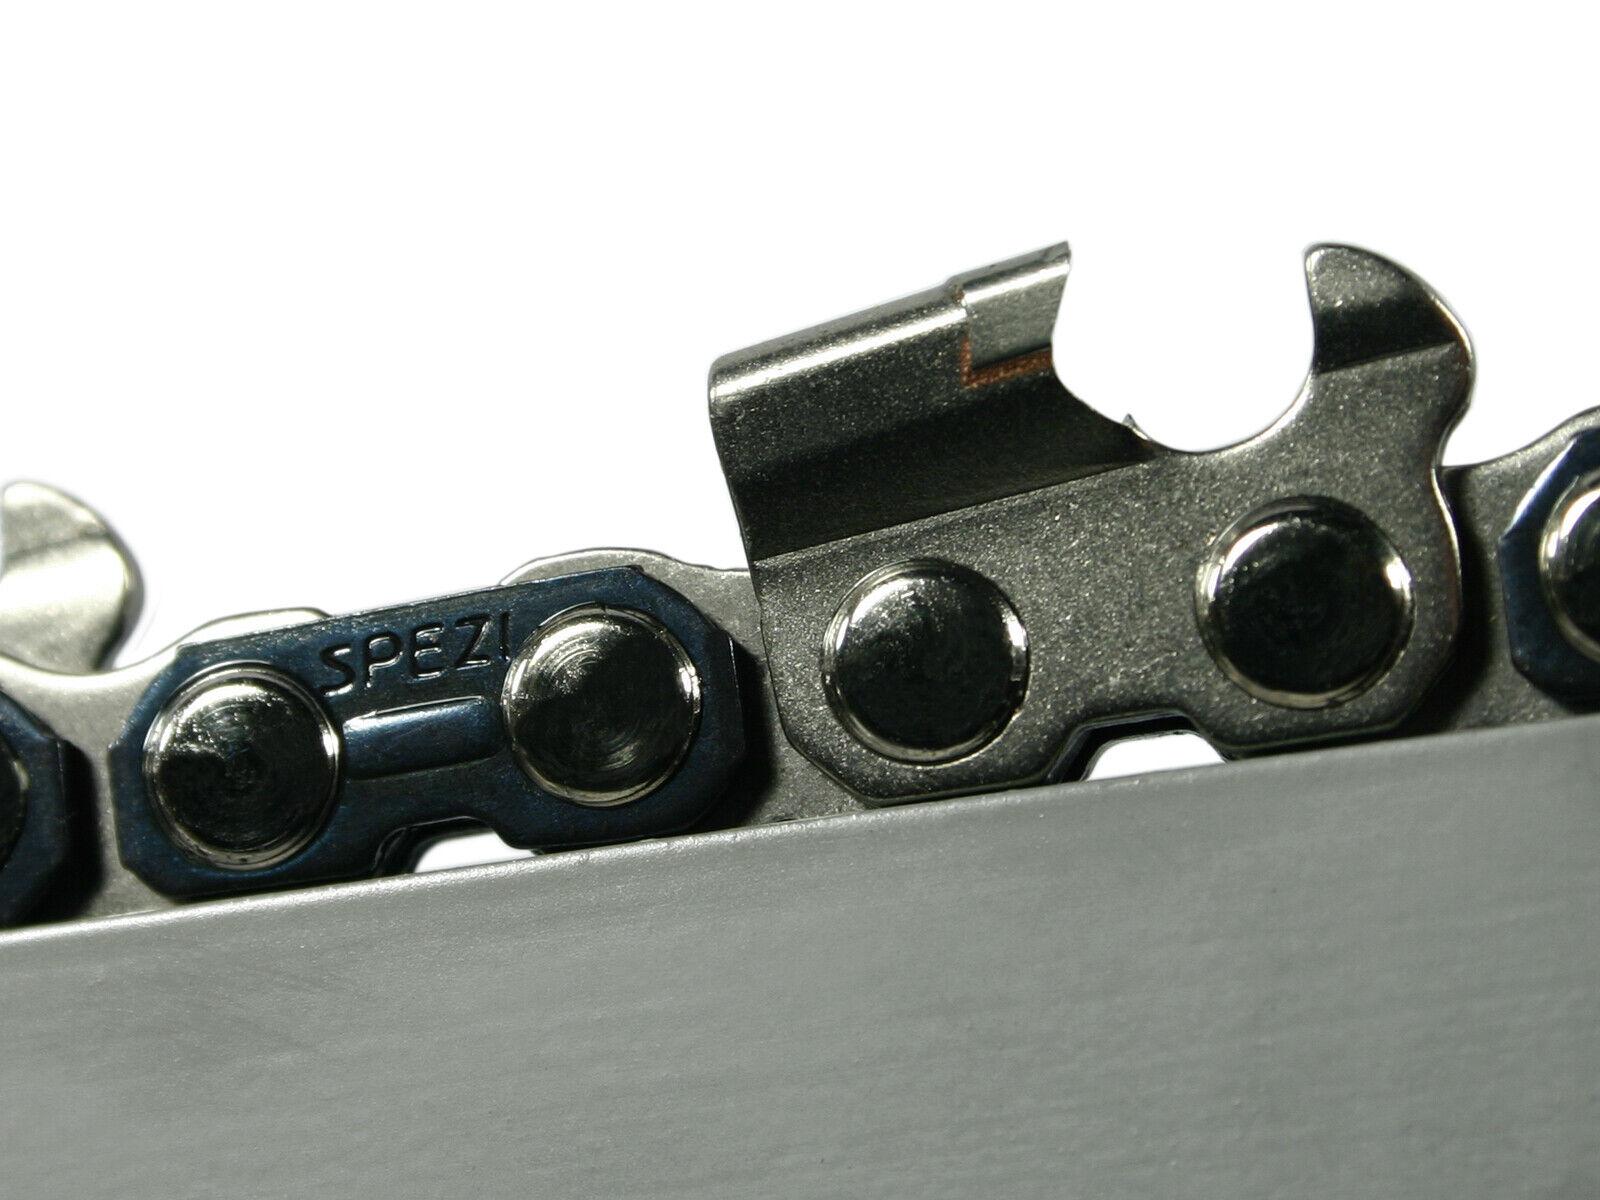 Metal duro cadena sierra adecuado para Husqvarna 570 60 cm 3 8  84 TG 1,5 mm Cochebide